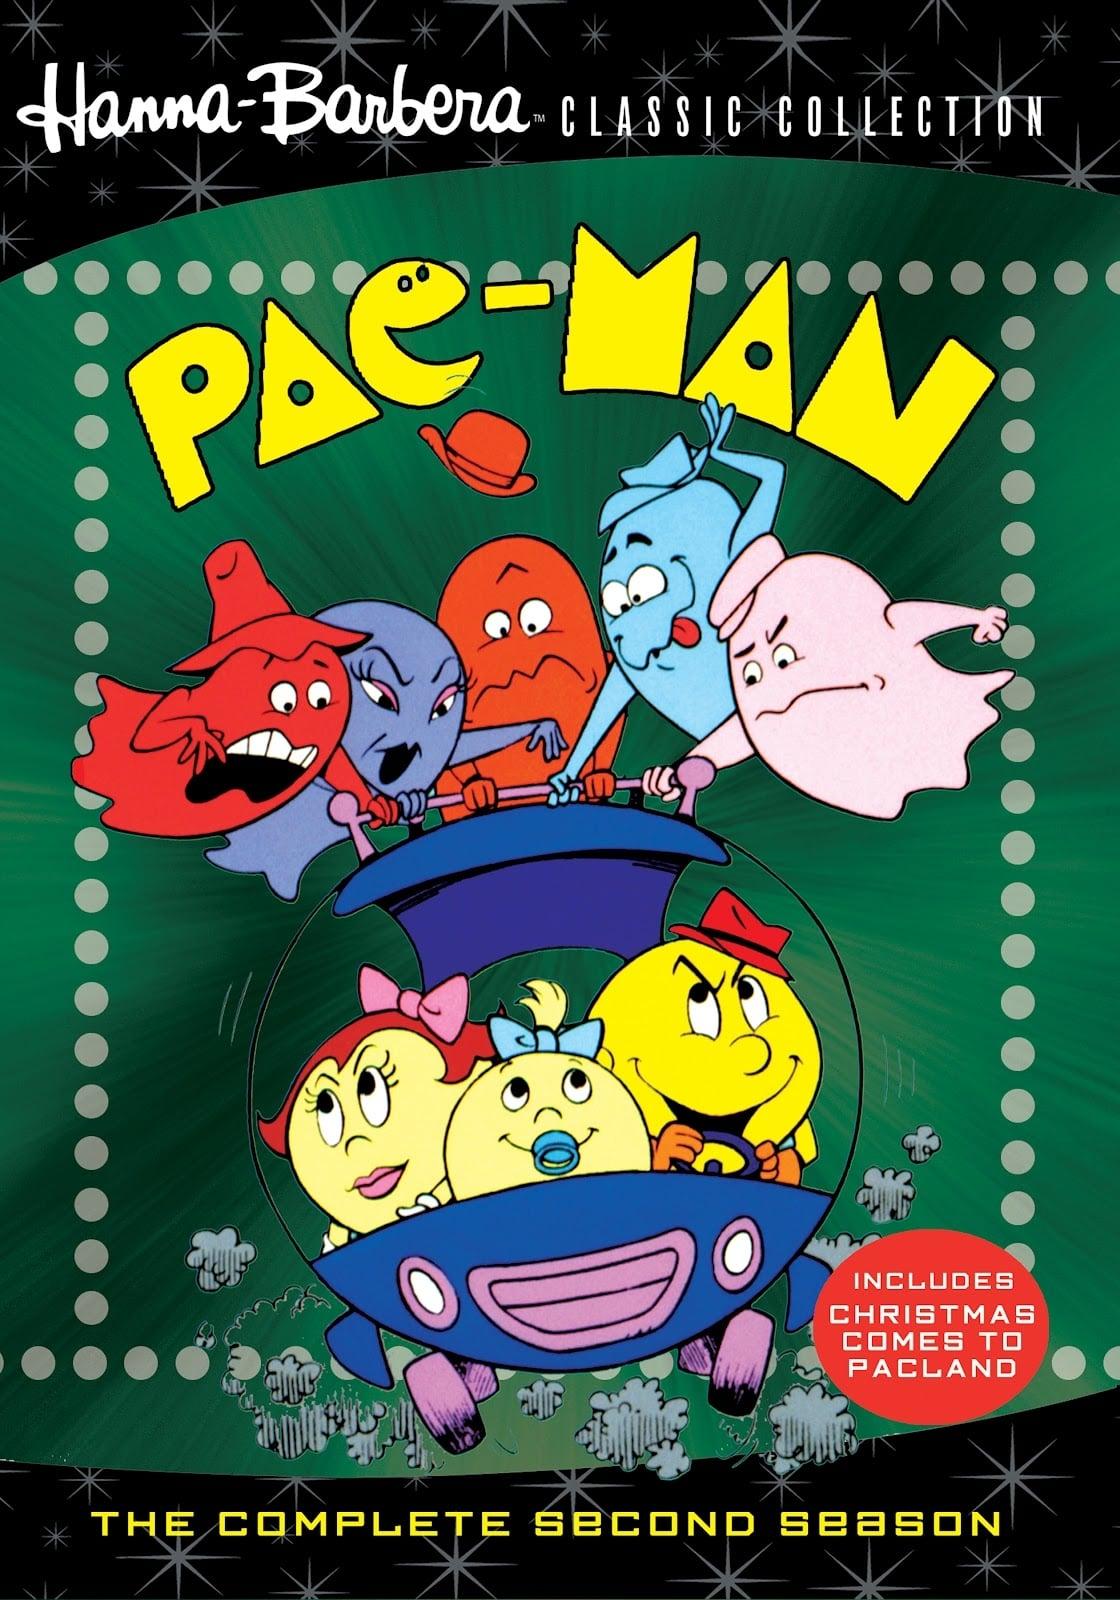 Pac-Man (1982)